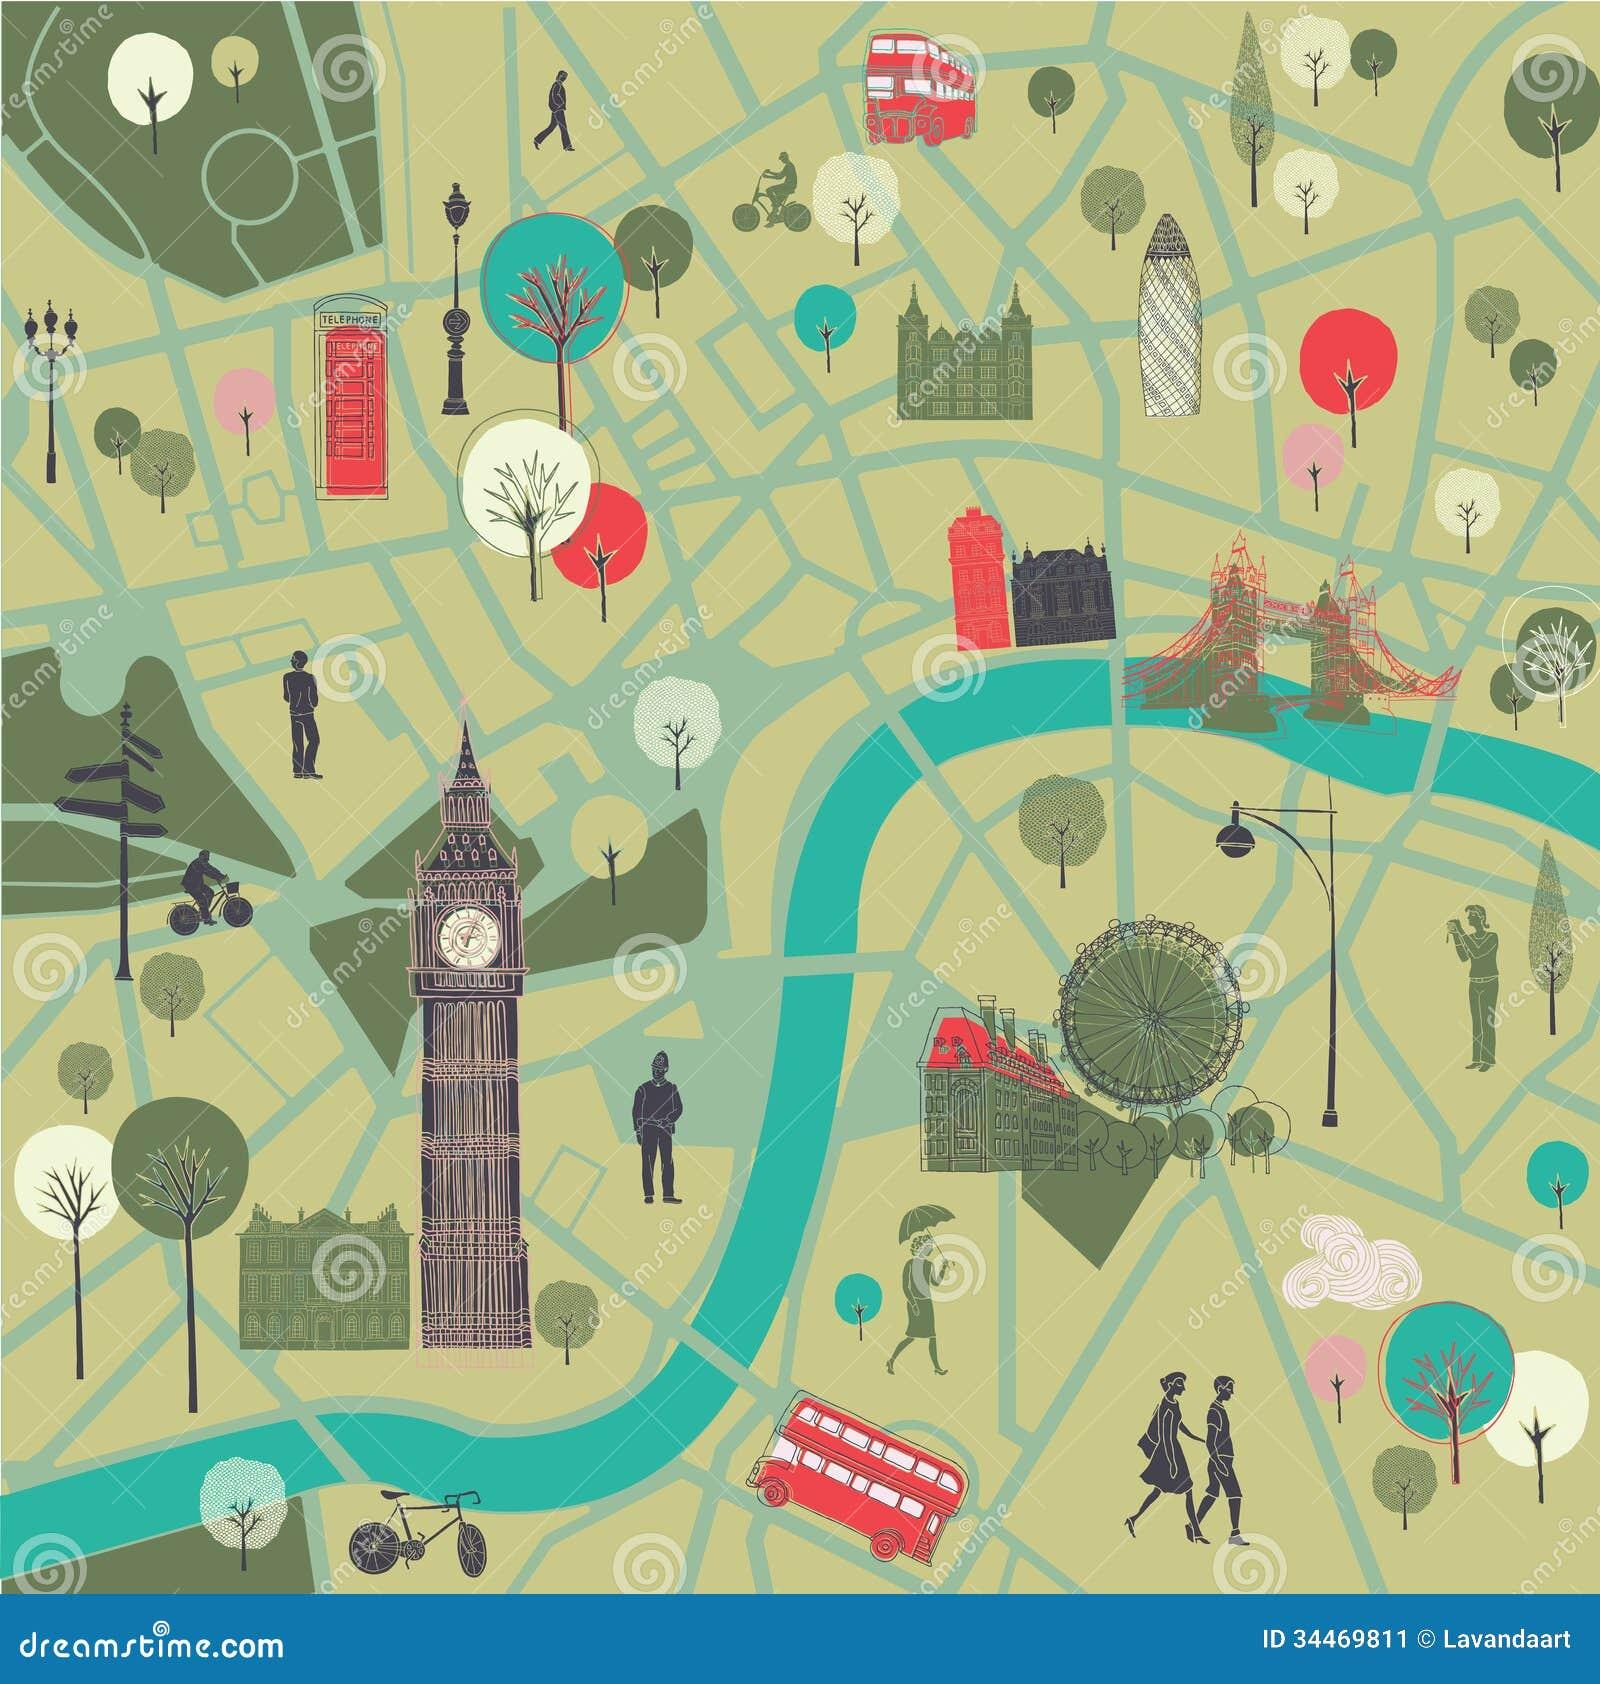 Map Of London With Landmarks Stock Image Image 34469811